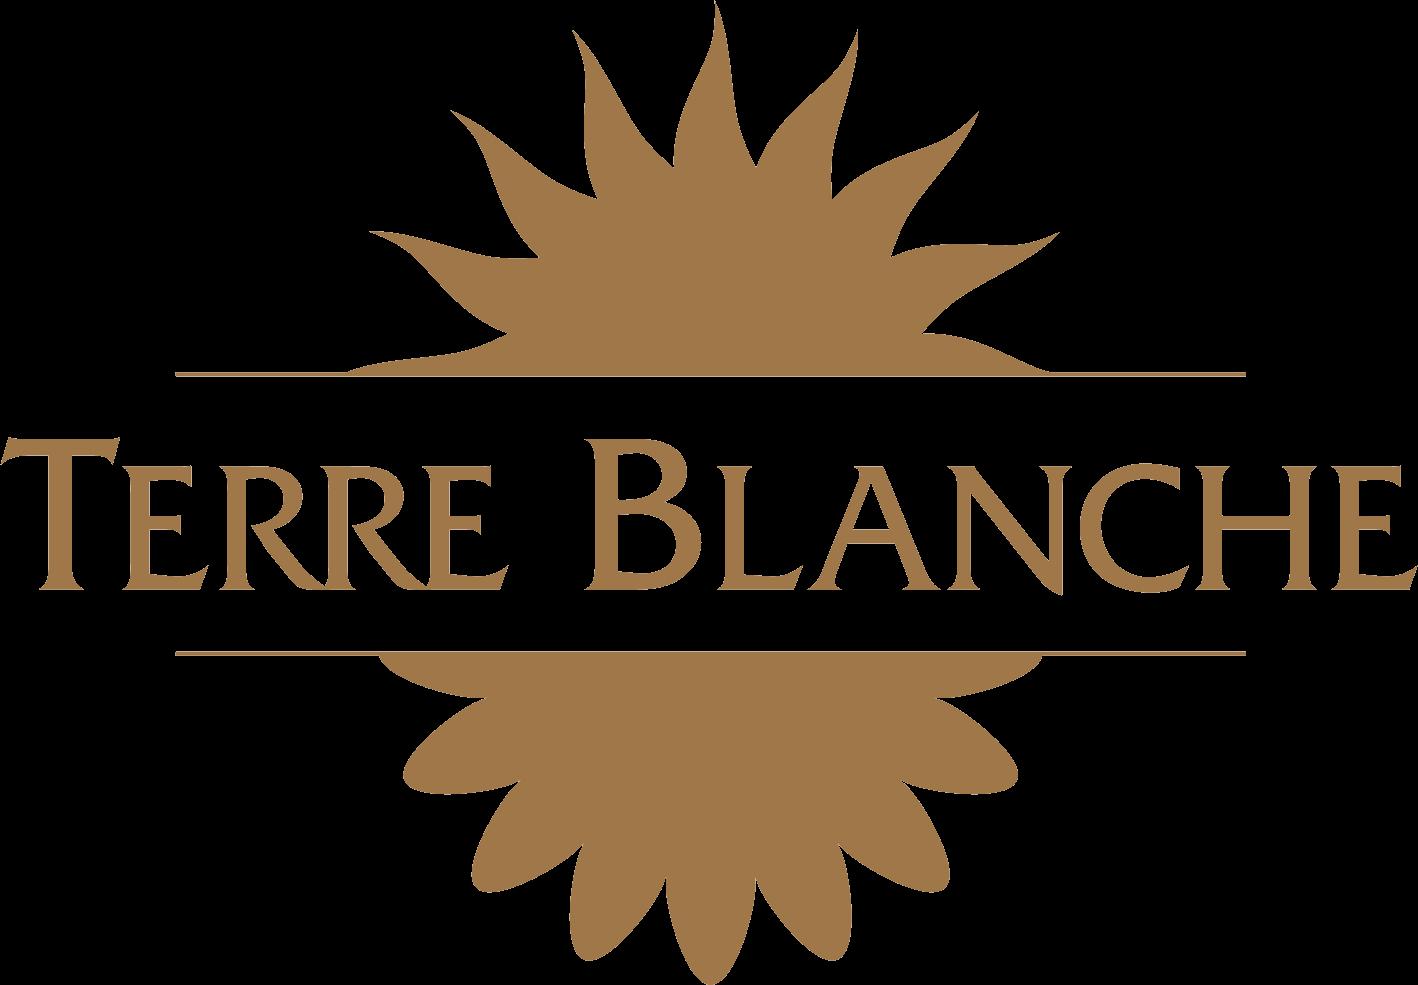 Terre Blanche_TB logo